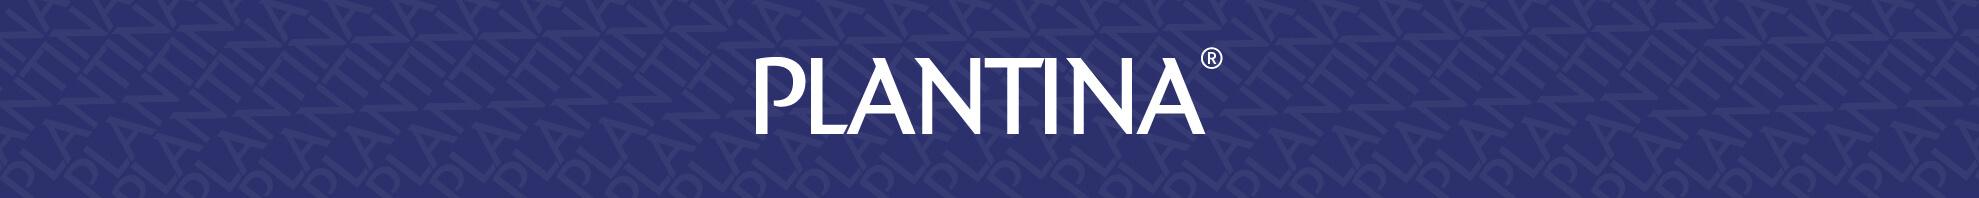 Plantina